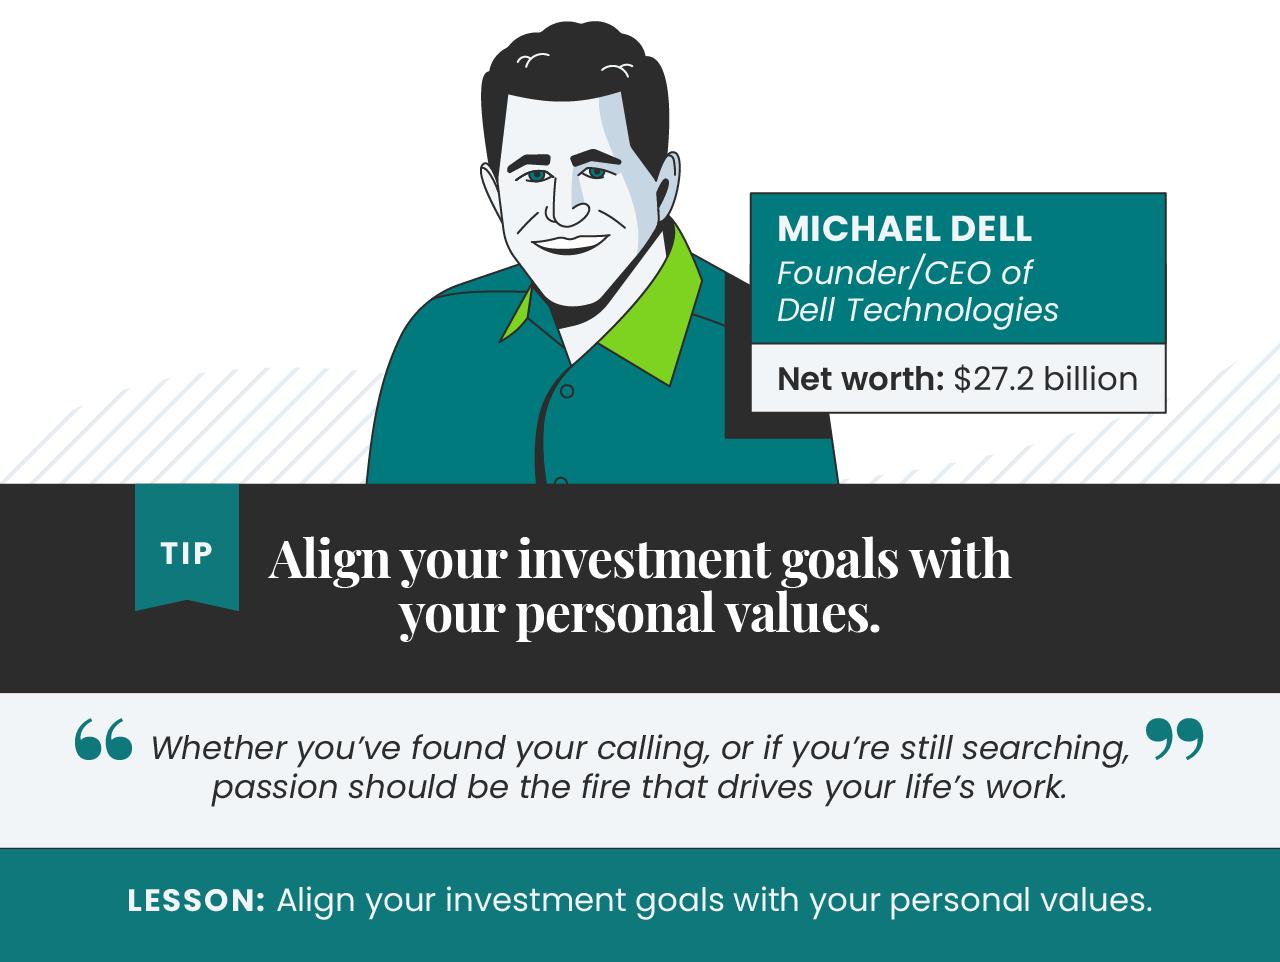 ANN Billionaire Investment Tips 04 Michael Dell